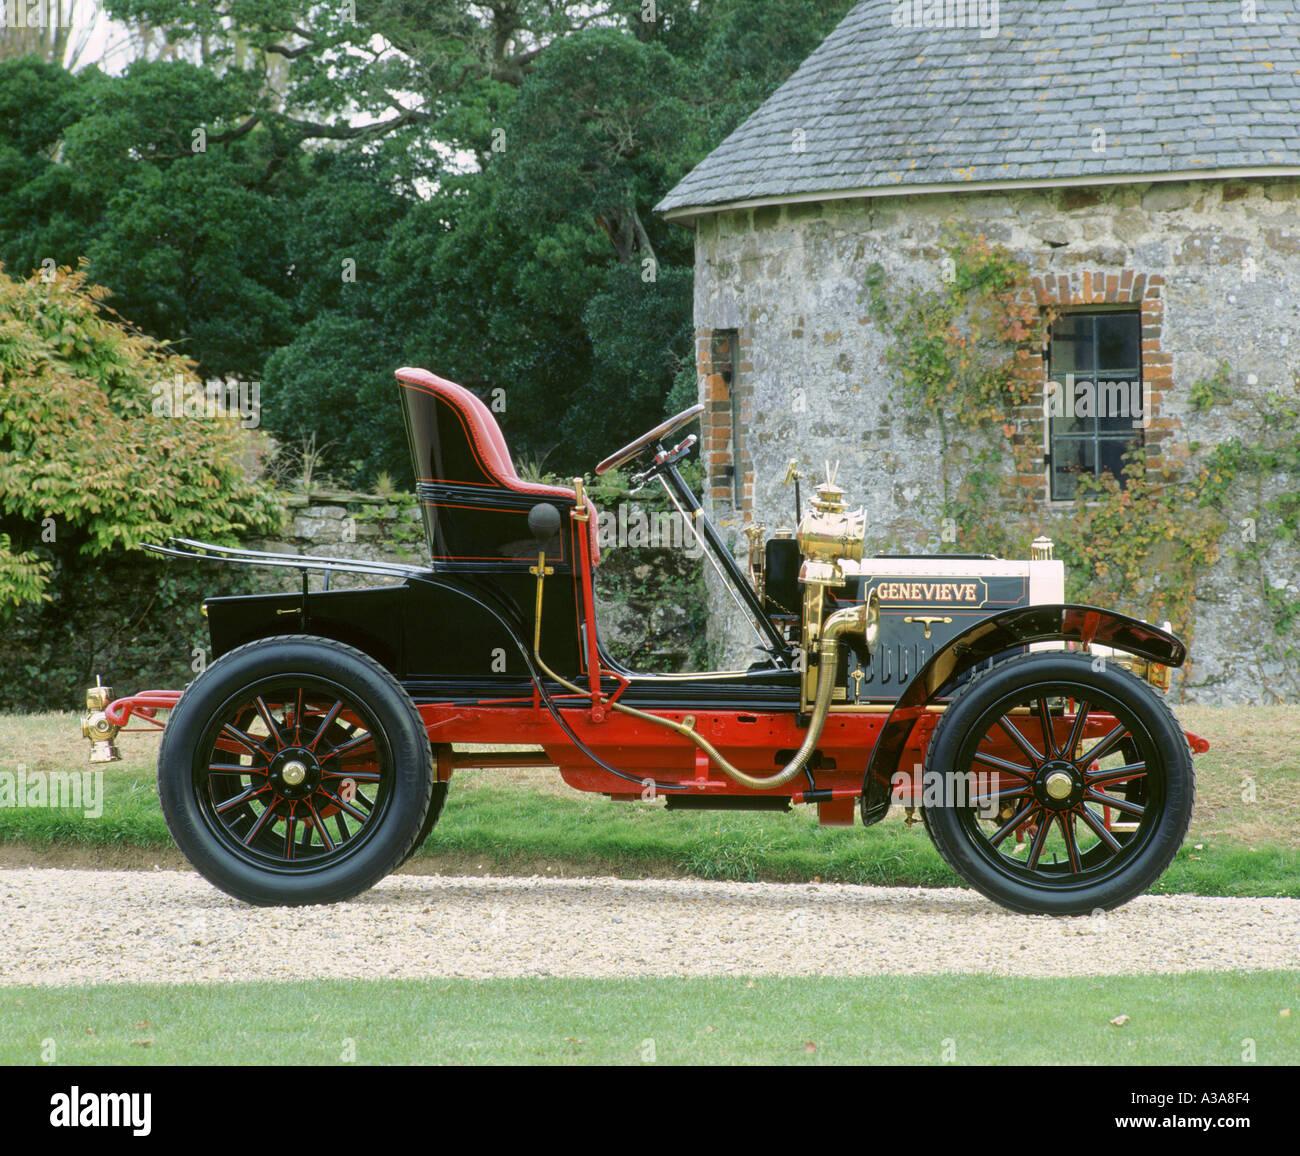 1904 Darracq Genevieve Stock Photo